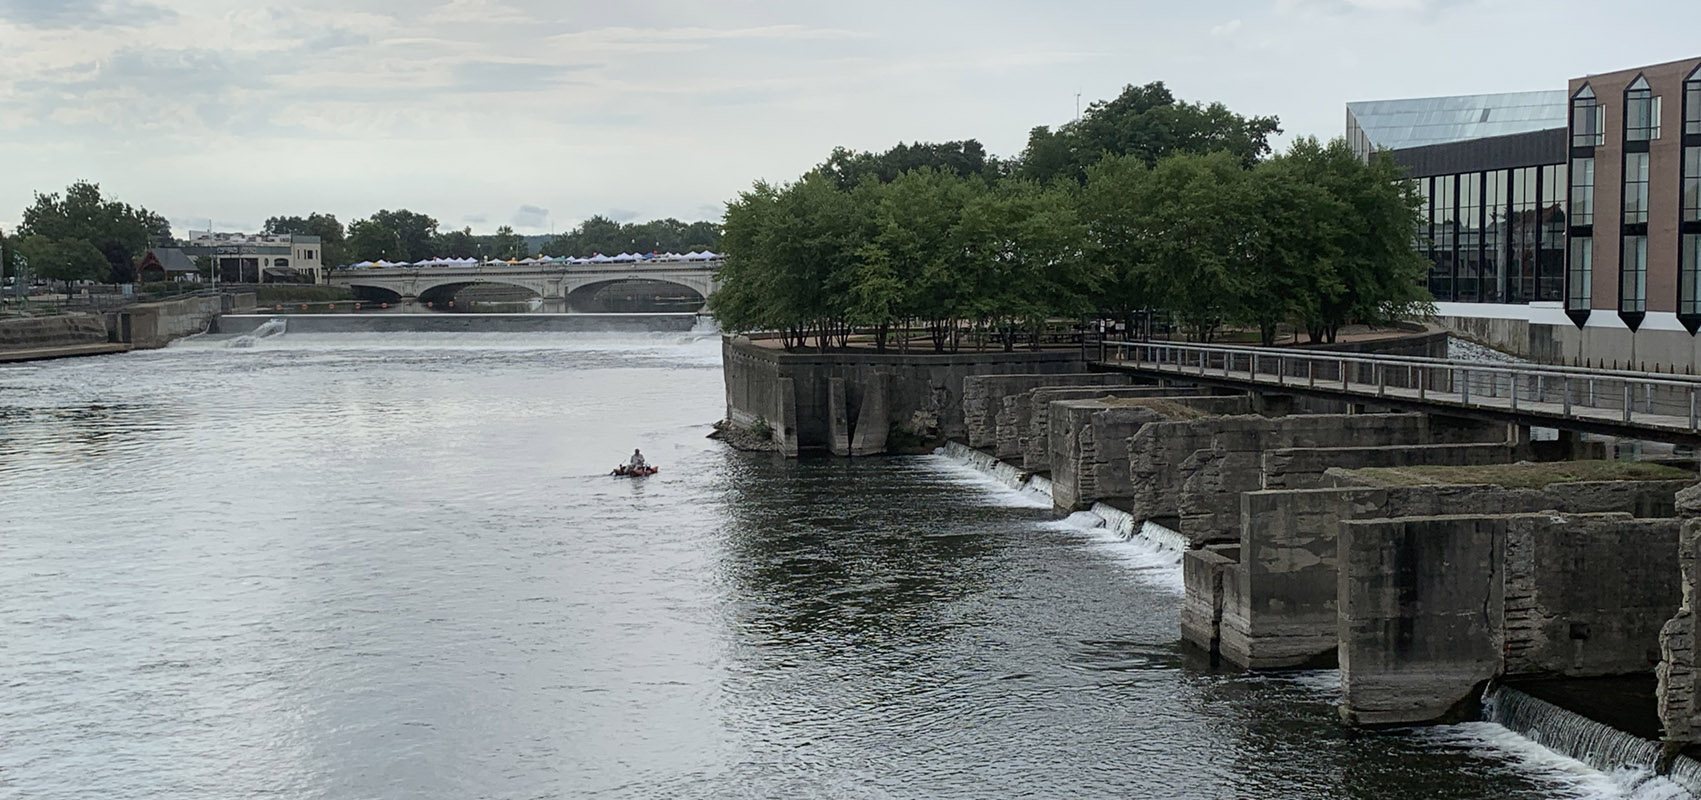 12.jefferson.St.bridge.800.jpg